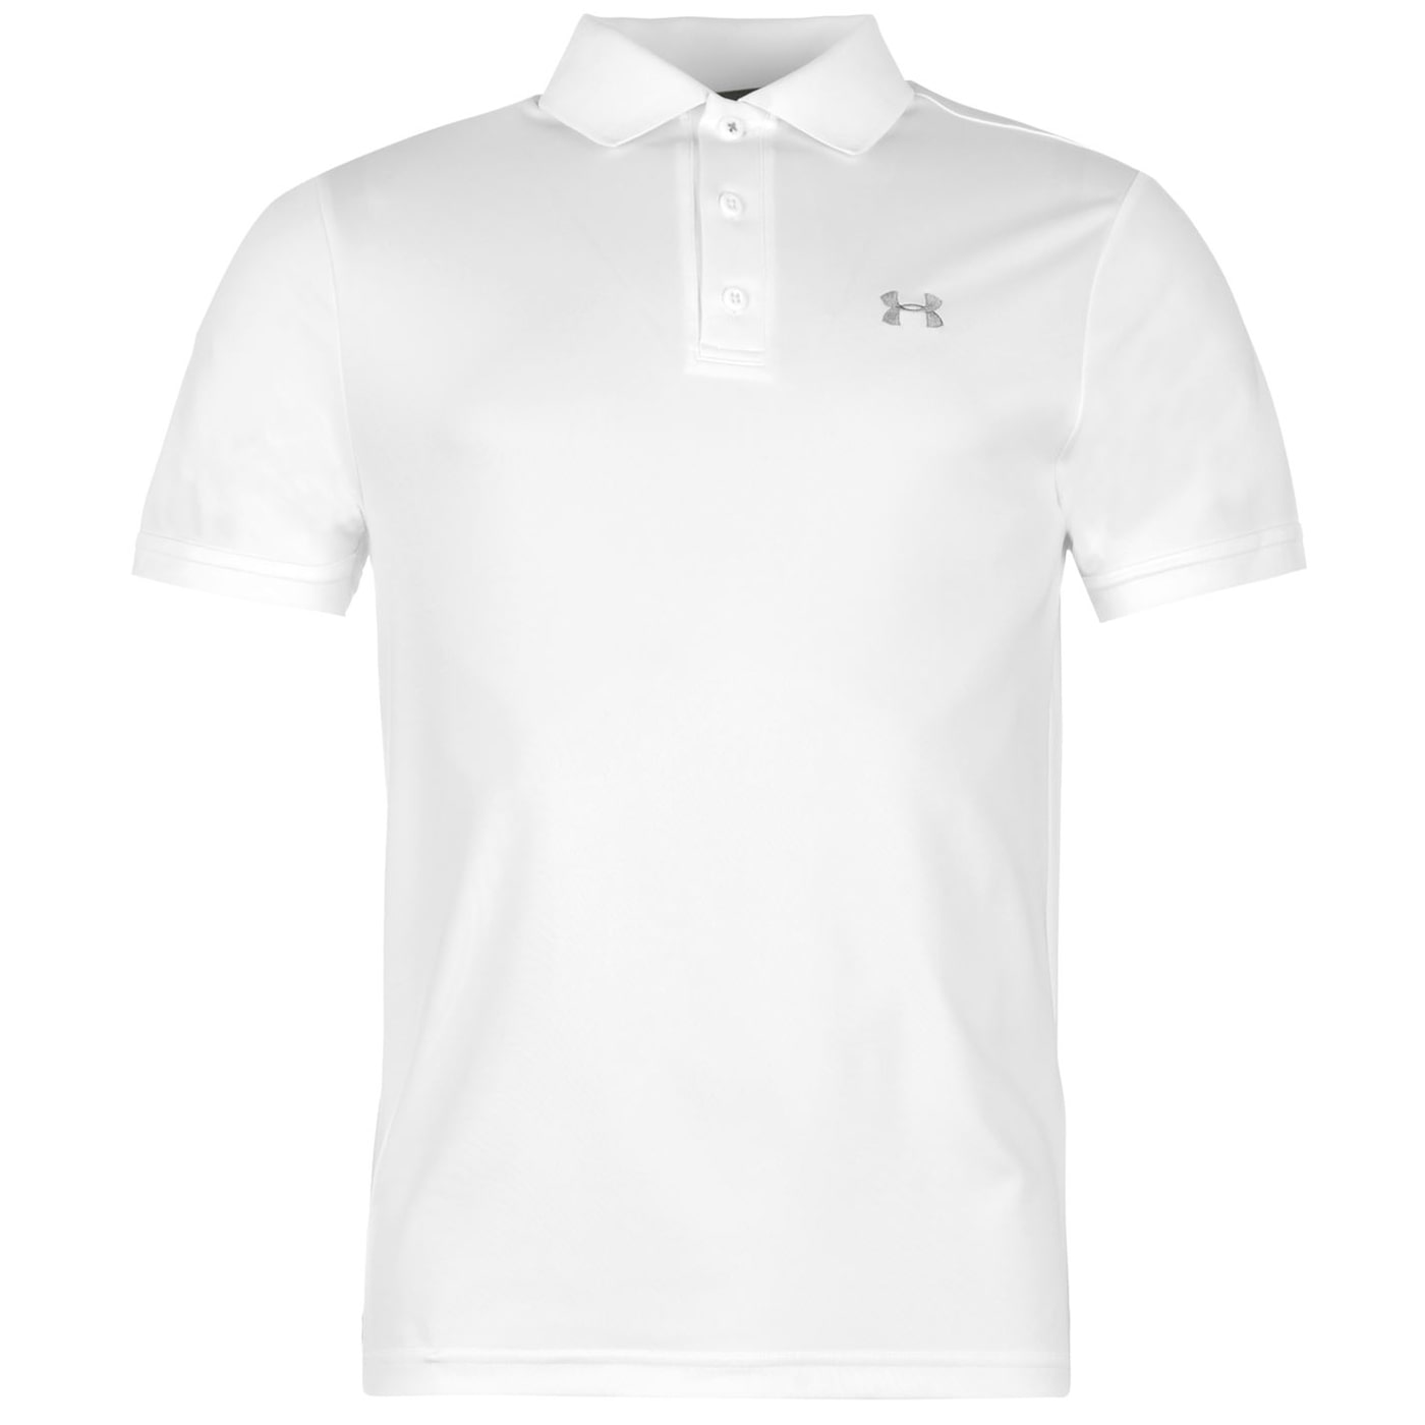 ba052ffd86f5 Under Armour Performance Polo Shirt Mens